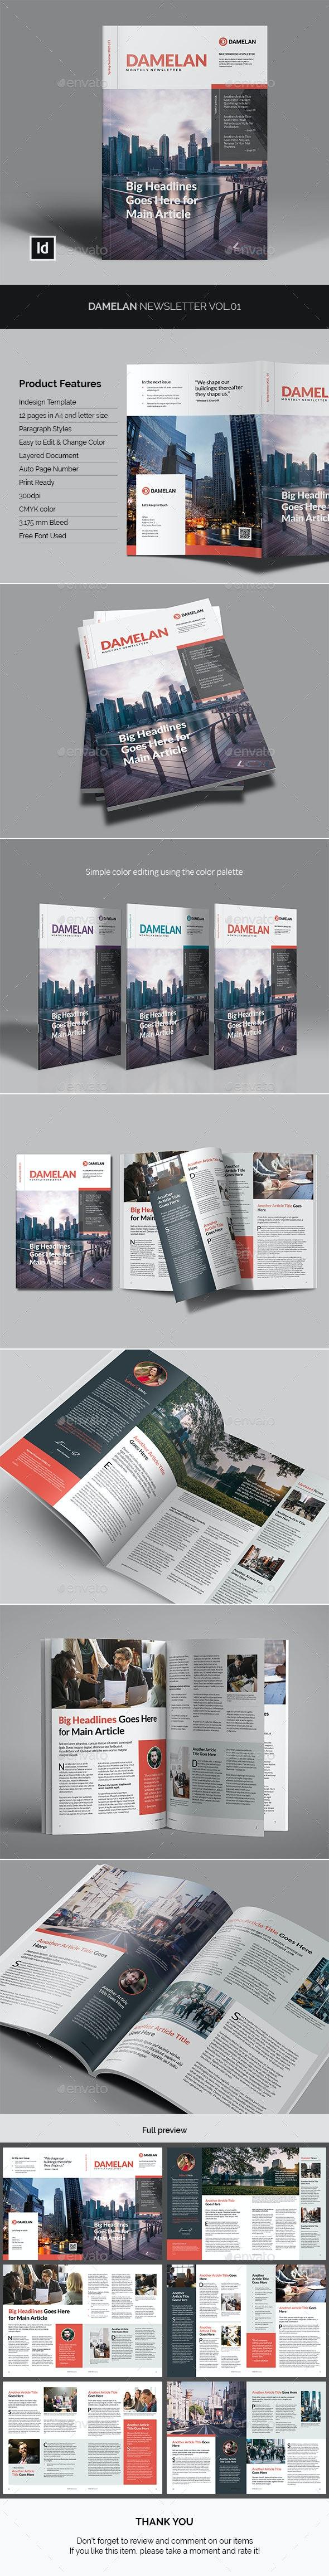 Damelan Newsletter Vol.01 - Newsletters Print Templates